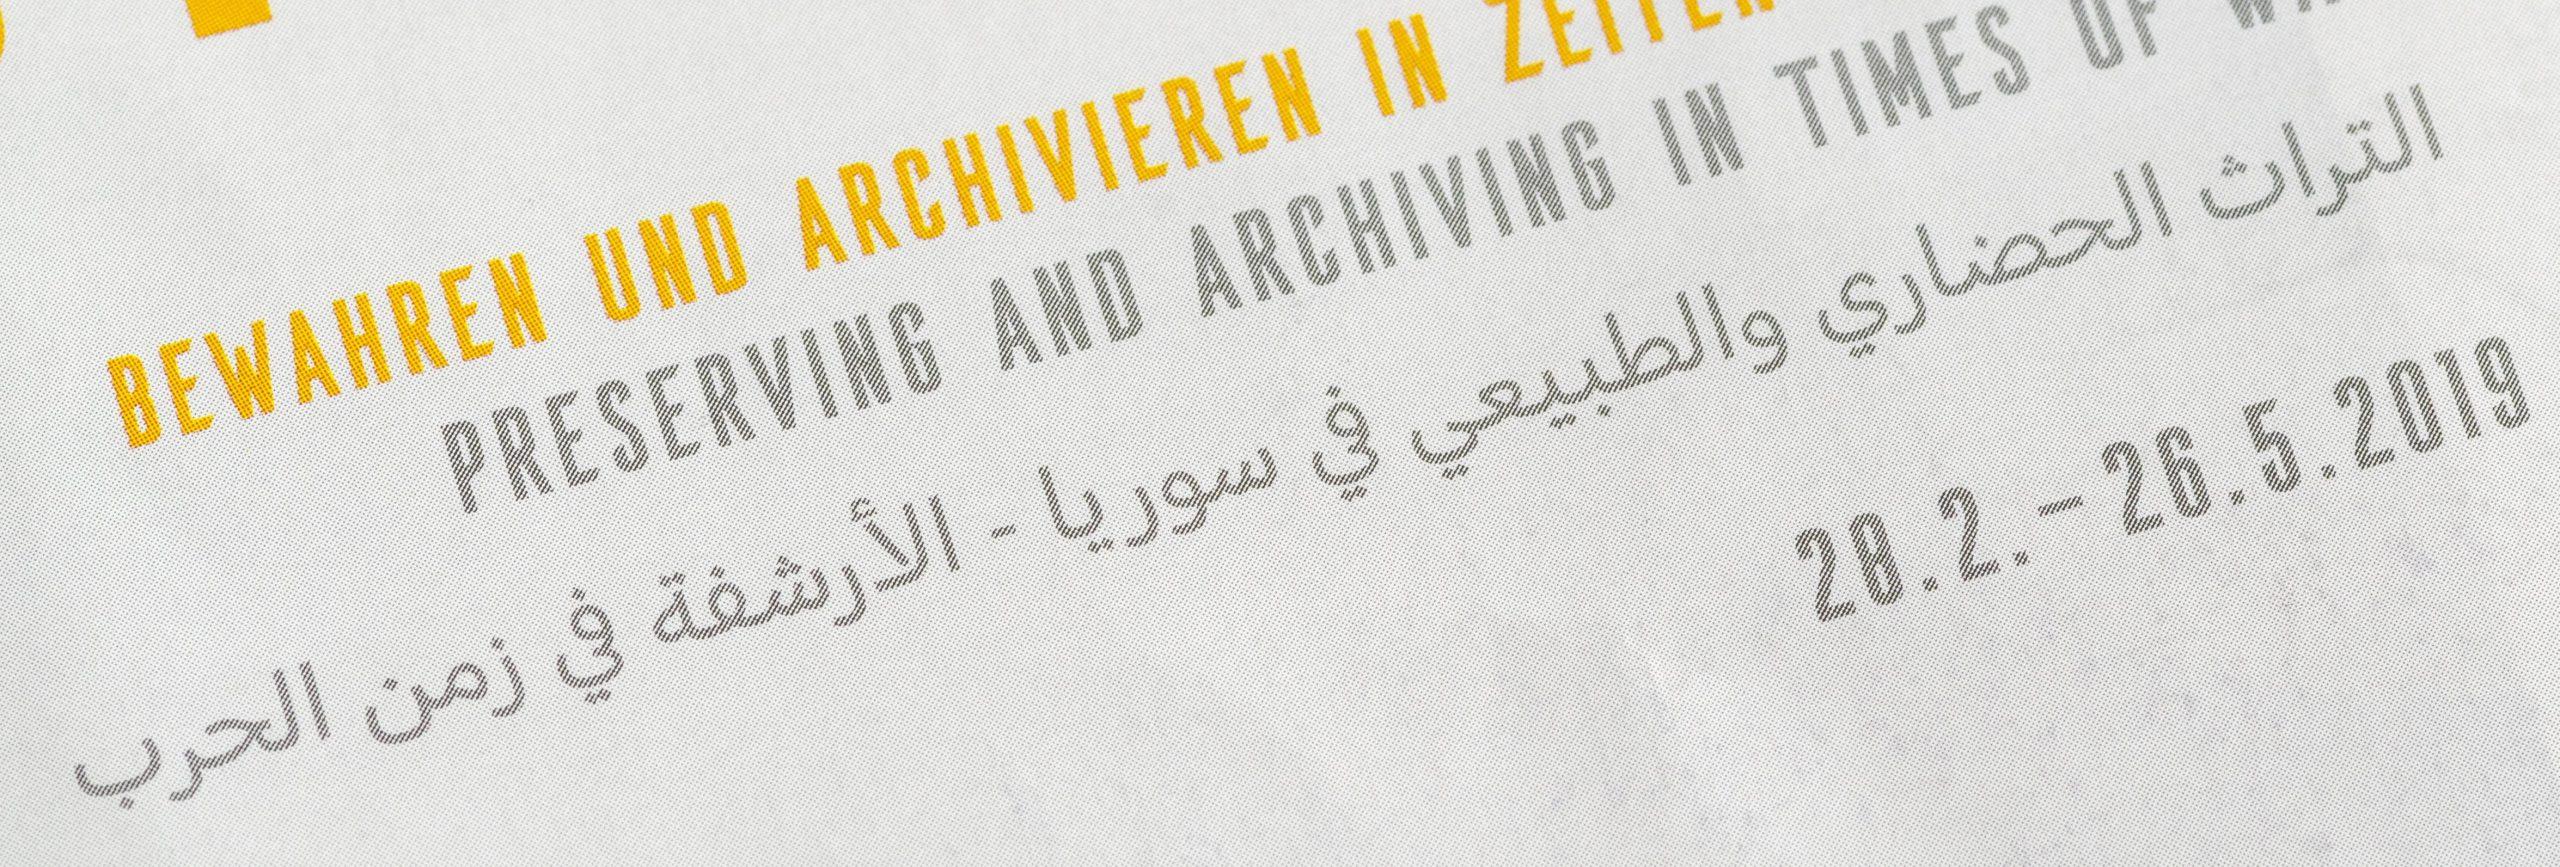 SkolarSansAr on Museum für Islamische Kunst Berlin folder 2